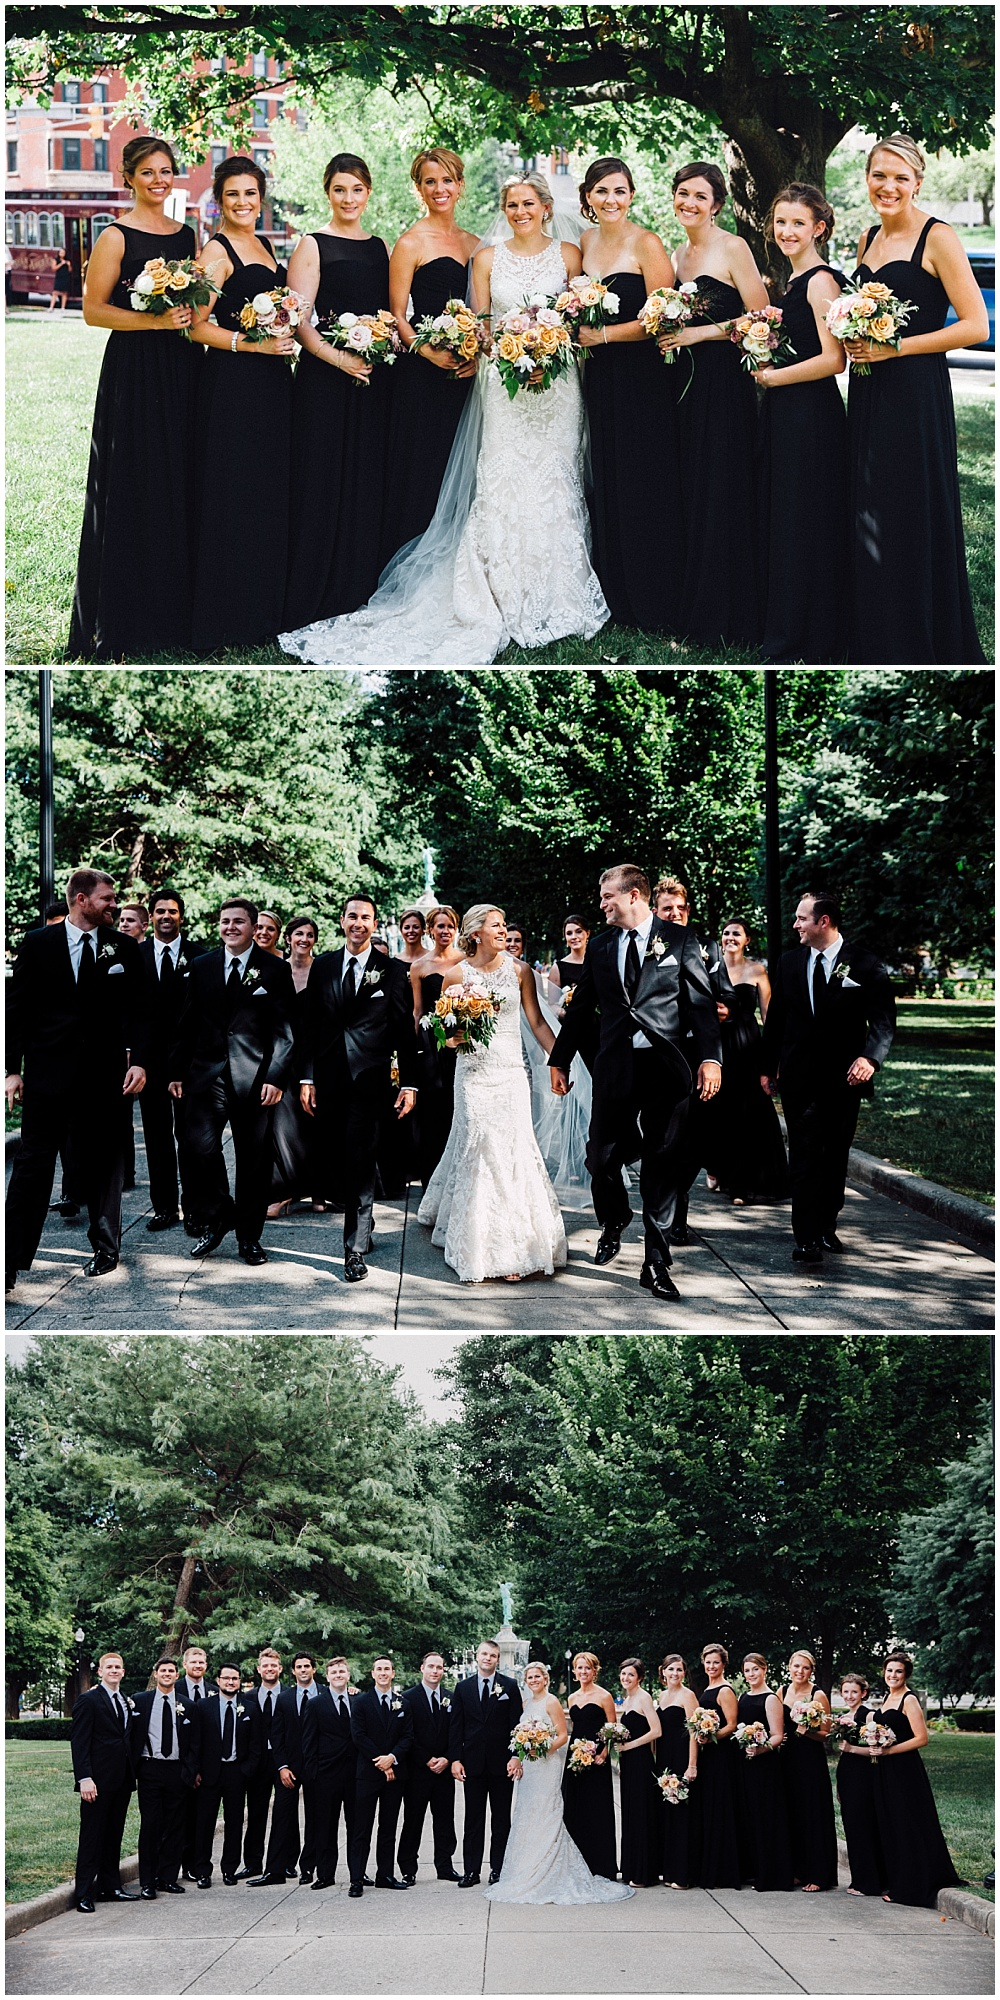 Summer wedding. Lace wedding dress and black bridesmaid dresses | Downtown Indianapolis Wedding by Caroline Grace Photography & Jessica Dum Wedding Coordination